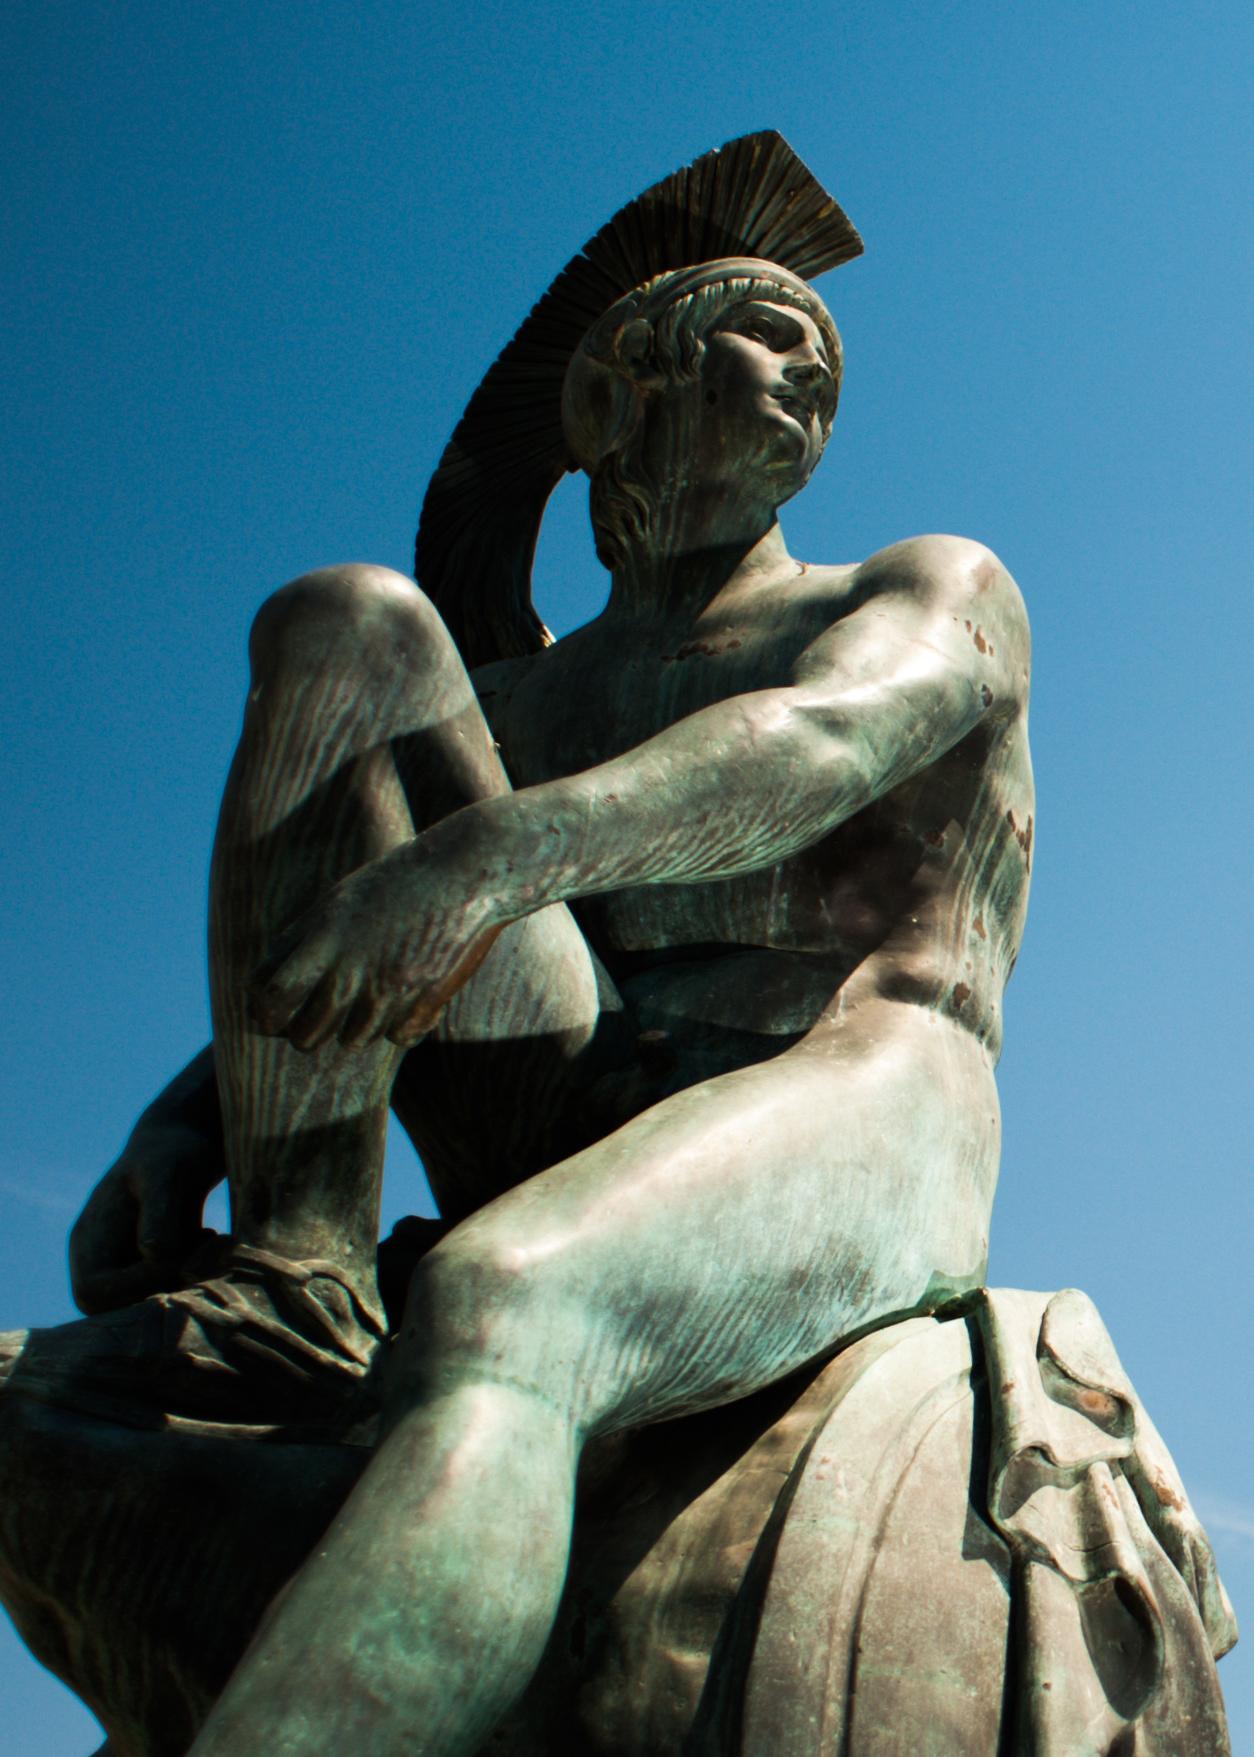 Statue_of_Theseus,_Syntagma_Square._Athens._Greece.jpg